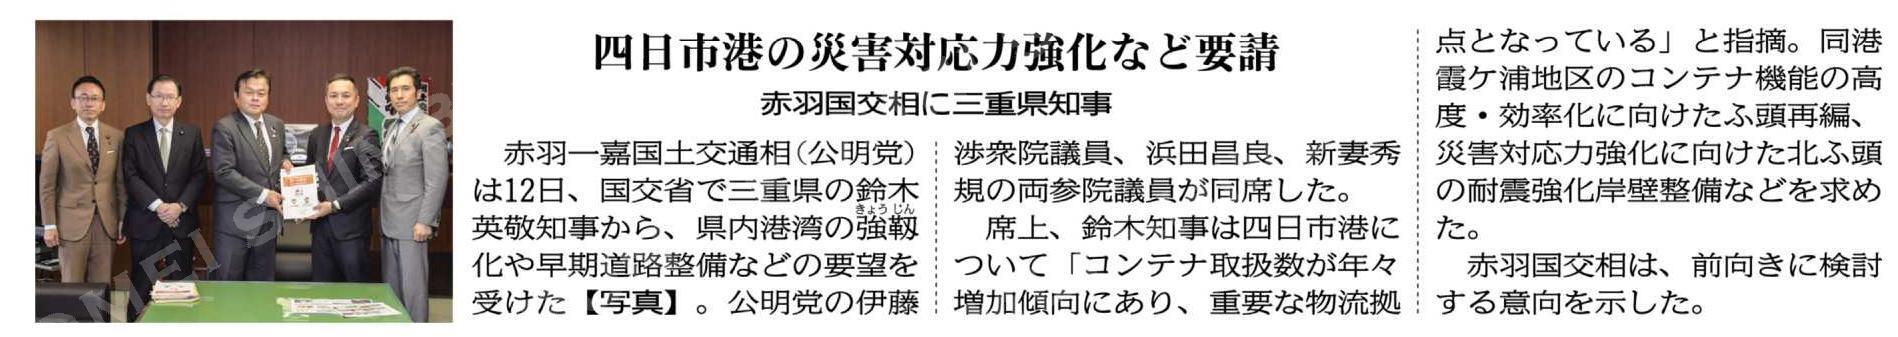 四日市港の災害対応力強化など要請/赤羽国交相に三重県知事